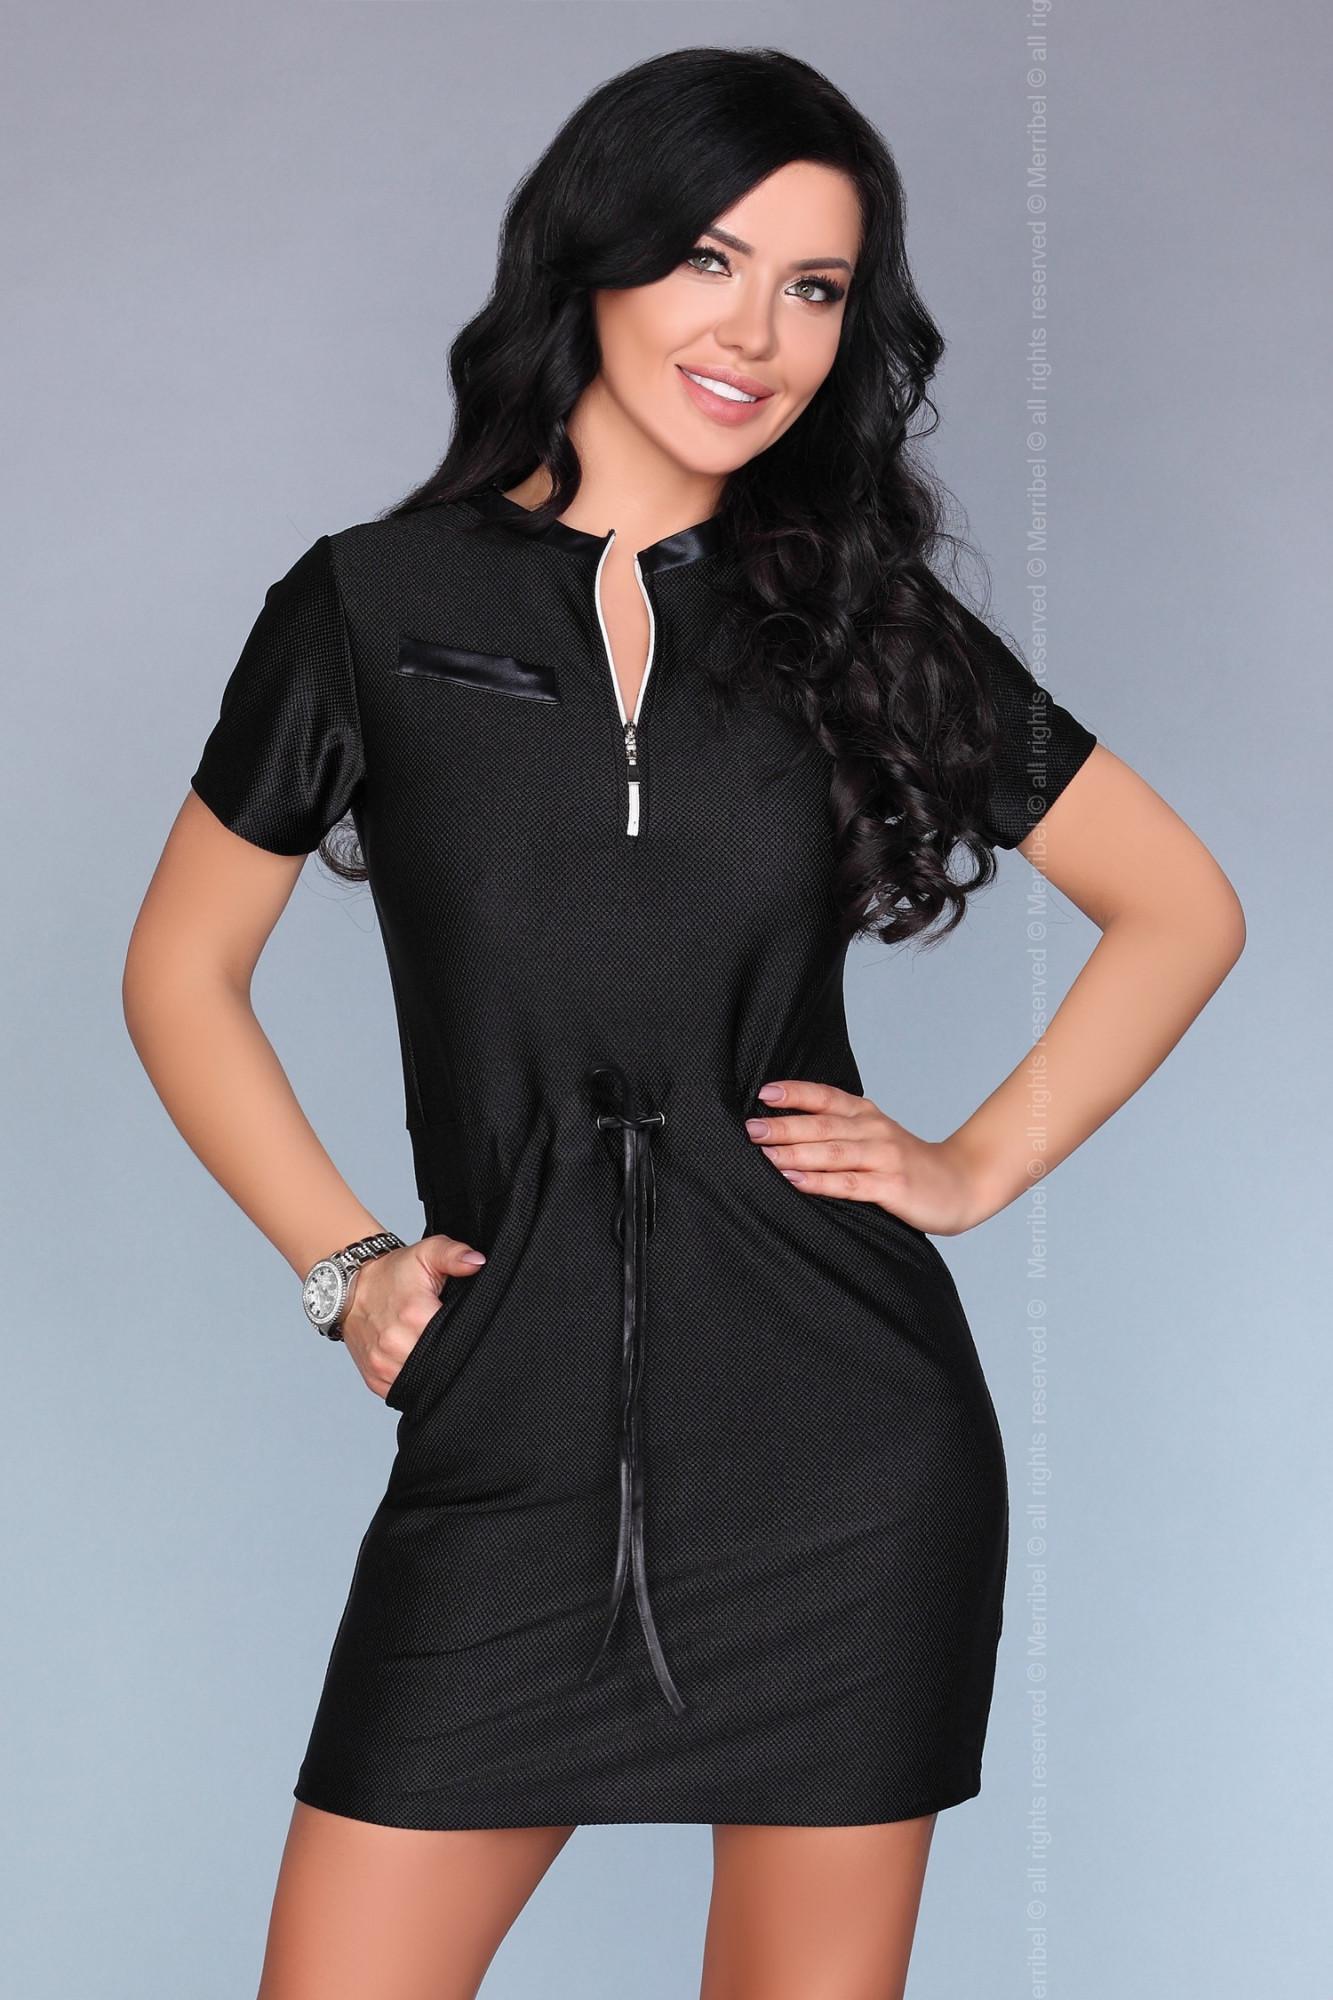 Dámské šaty model P30173 - Merribel černá L